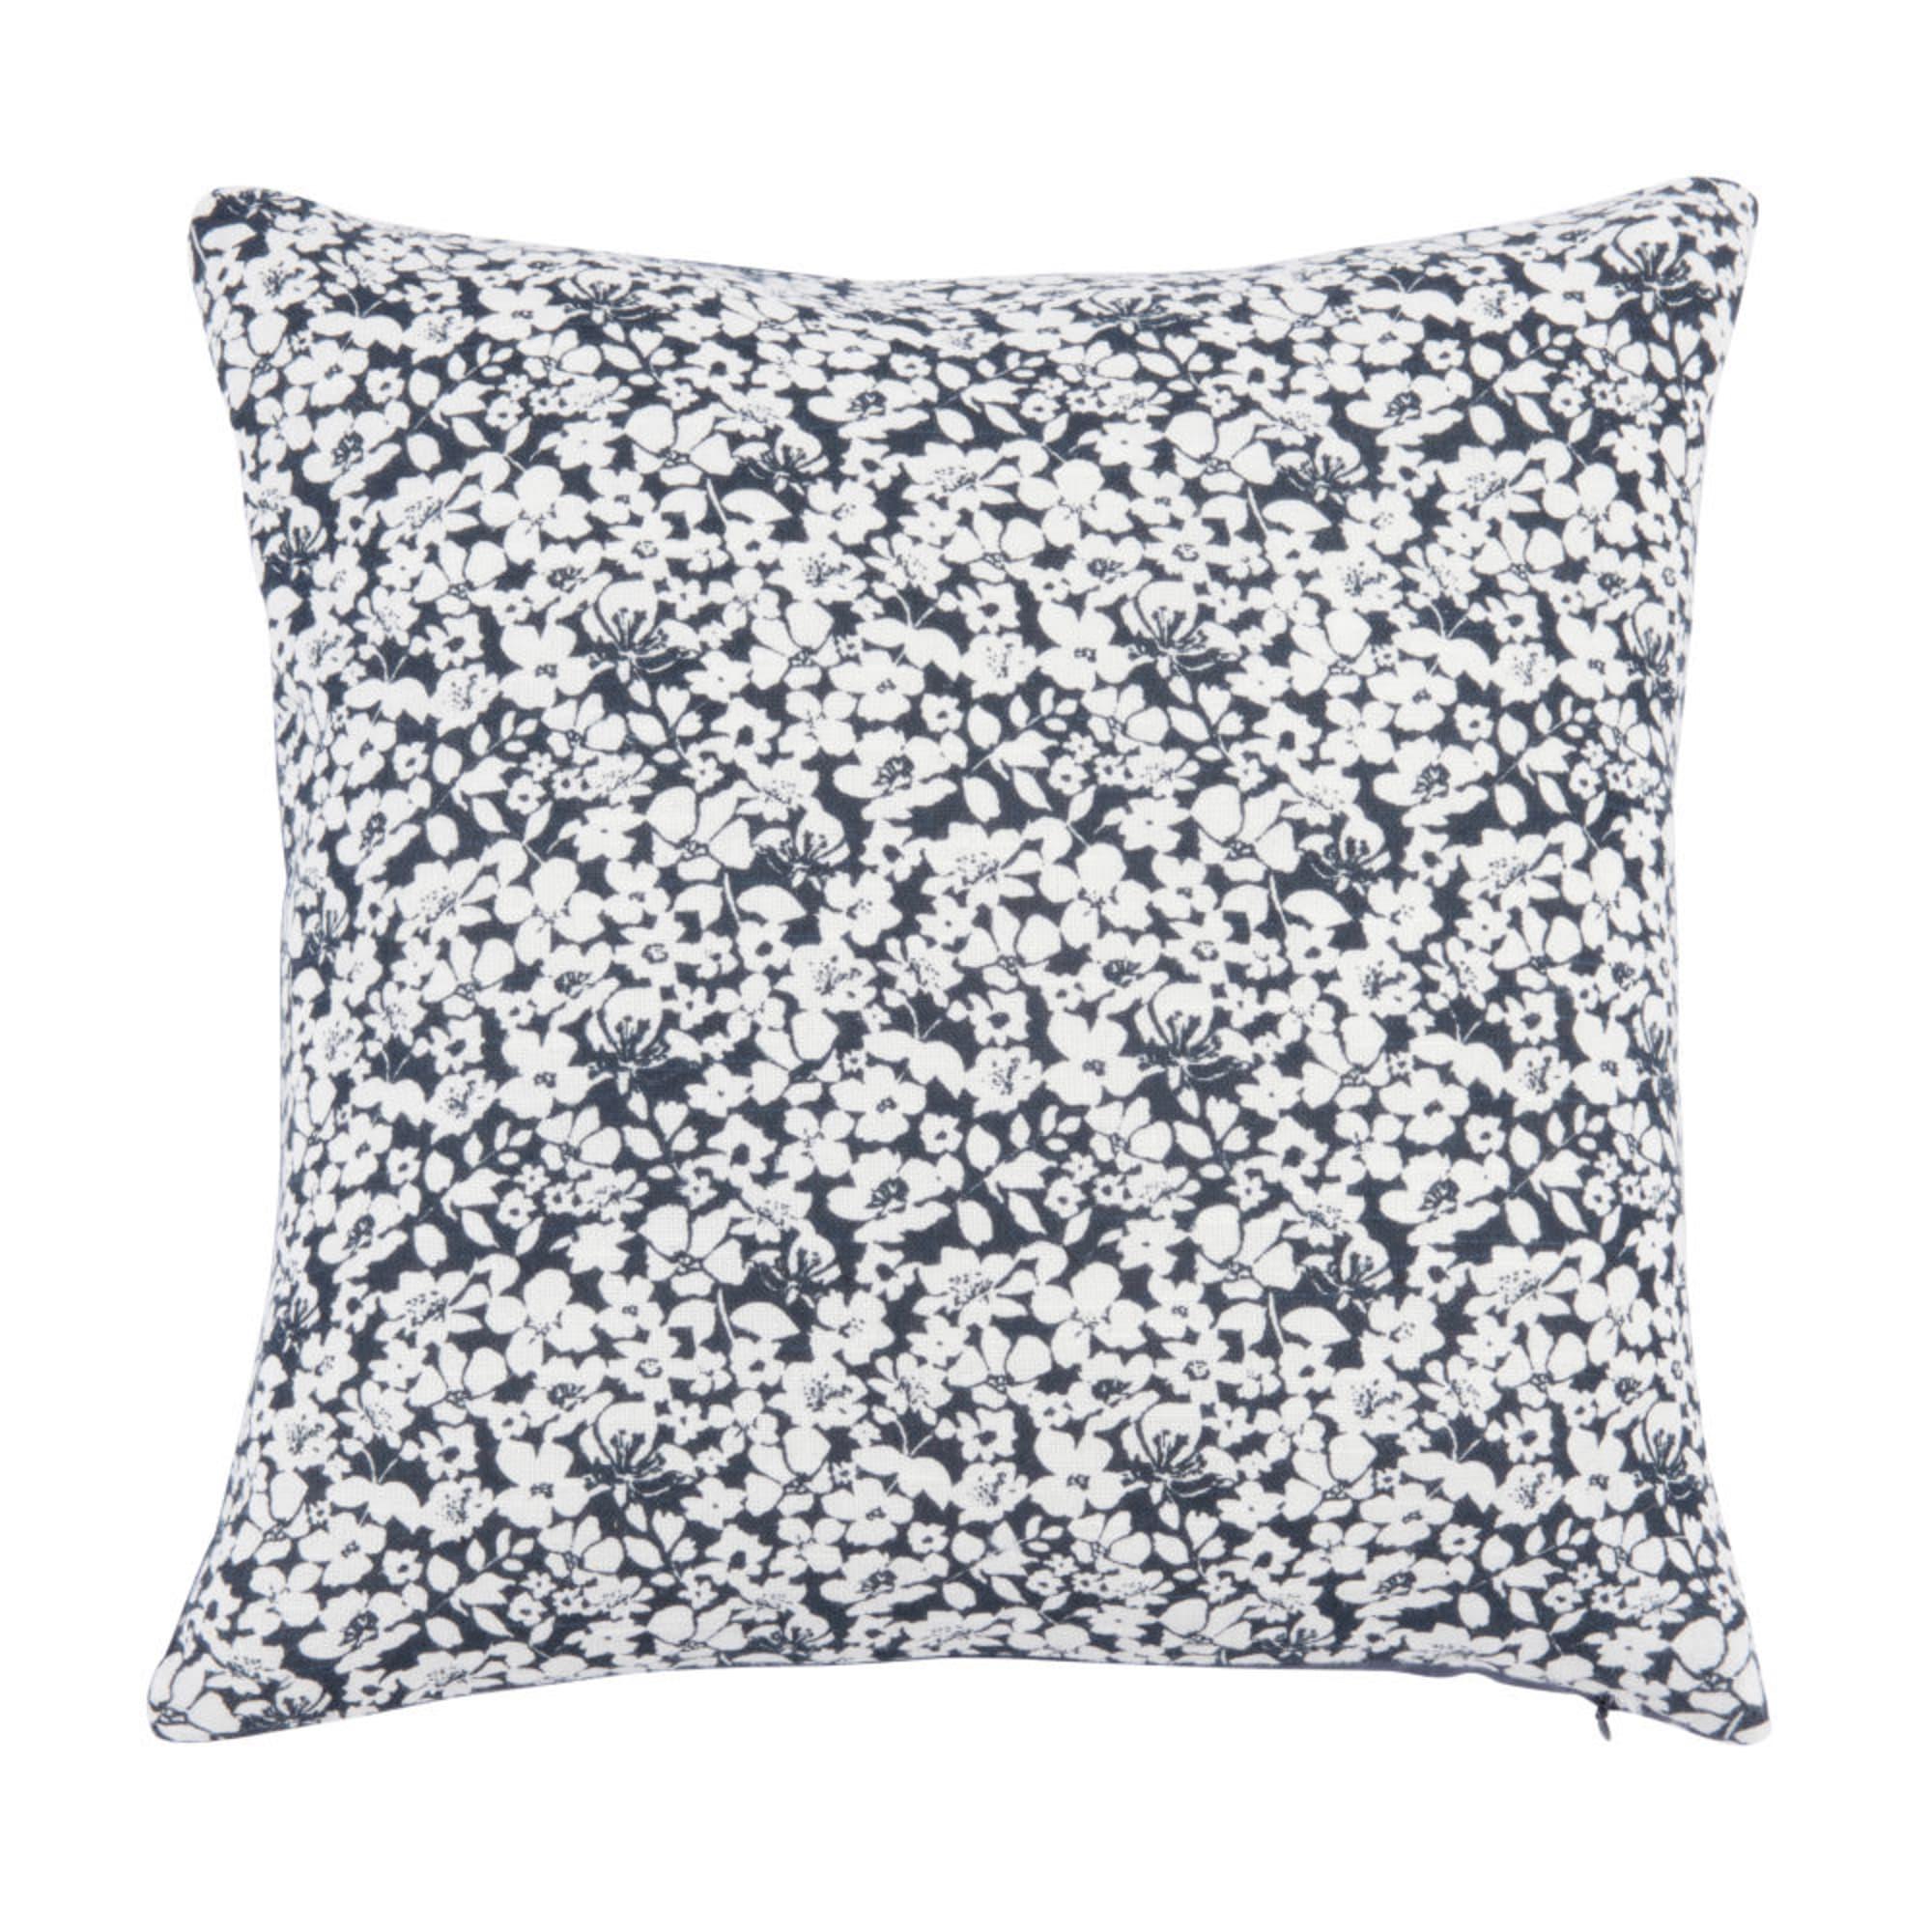 Morena. Funda de cojín de algodón con motivos de flores 40x40